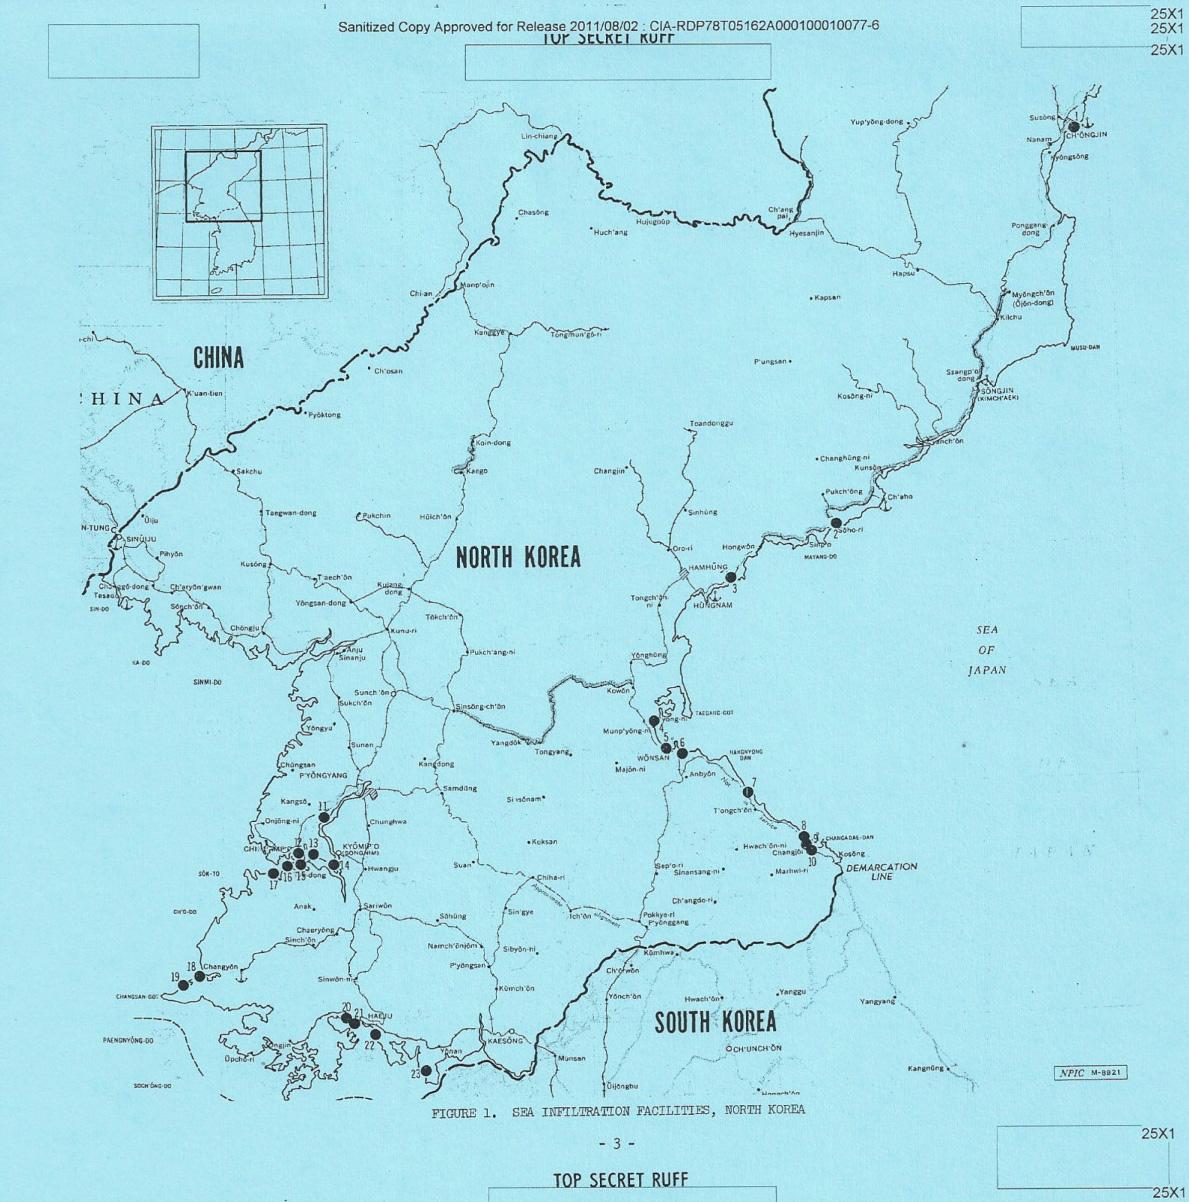 ulyces-northkoreaassassins-01